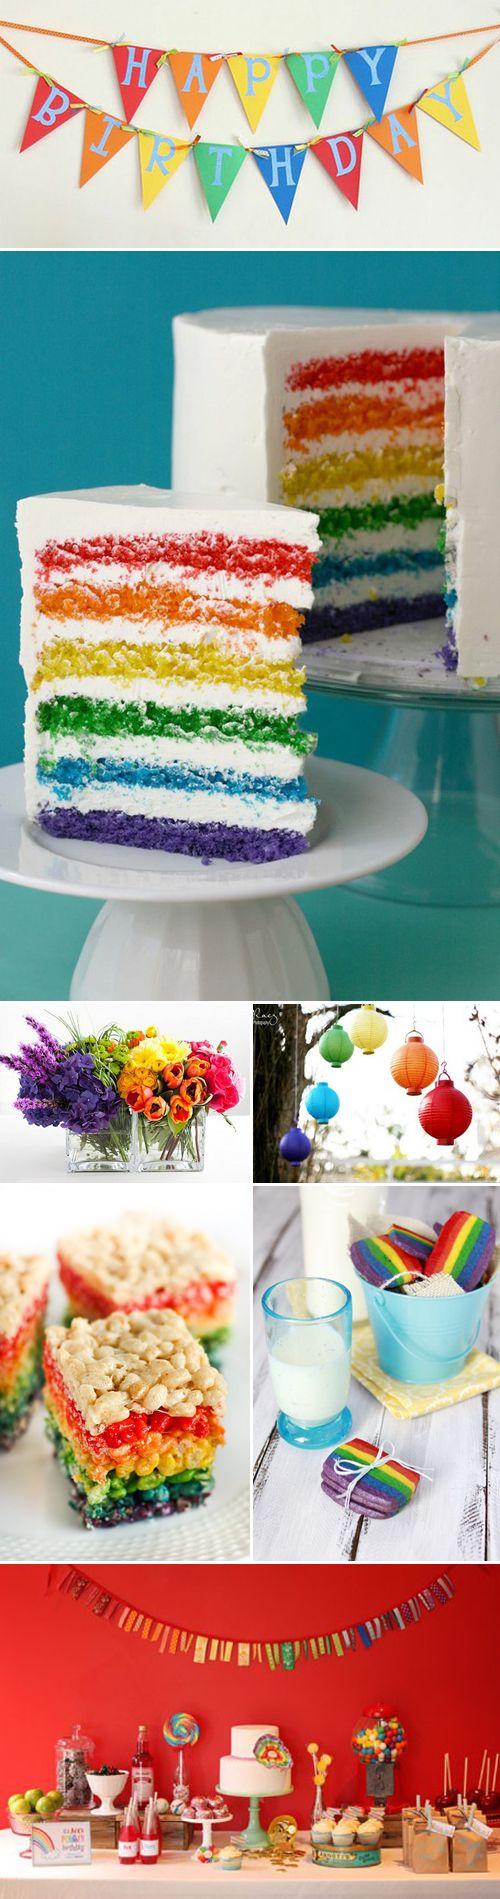 Rainbow Party Inspiration Board